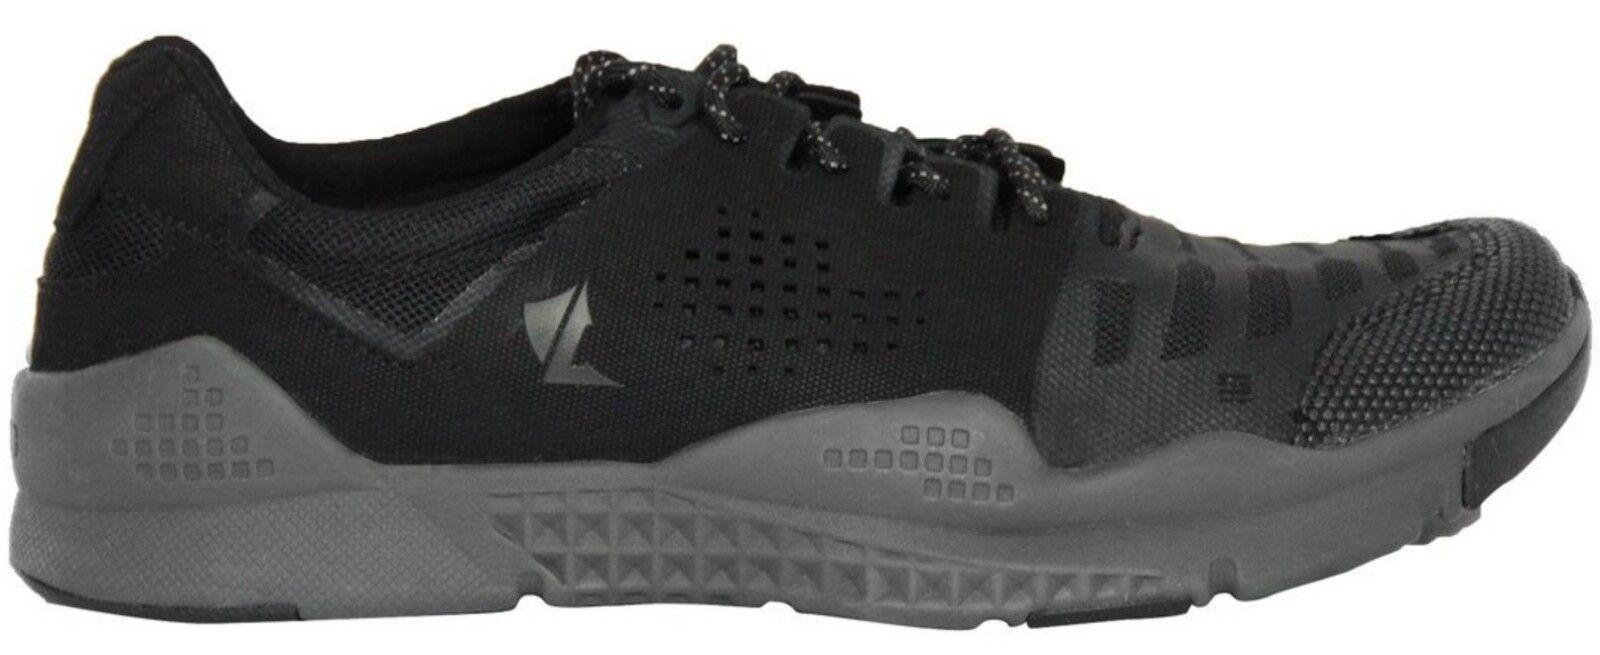 Lalo 1BU004 BKO Homme Bloodbird Noir Ops Bud S stabilité entraîneHommest Athlétique Chaussures